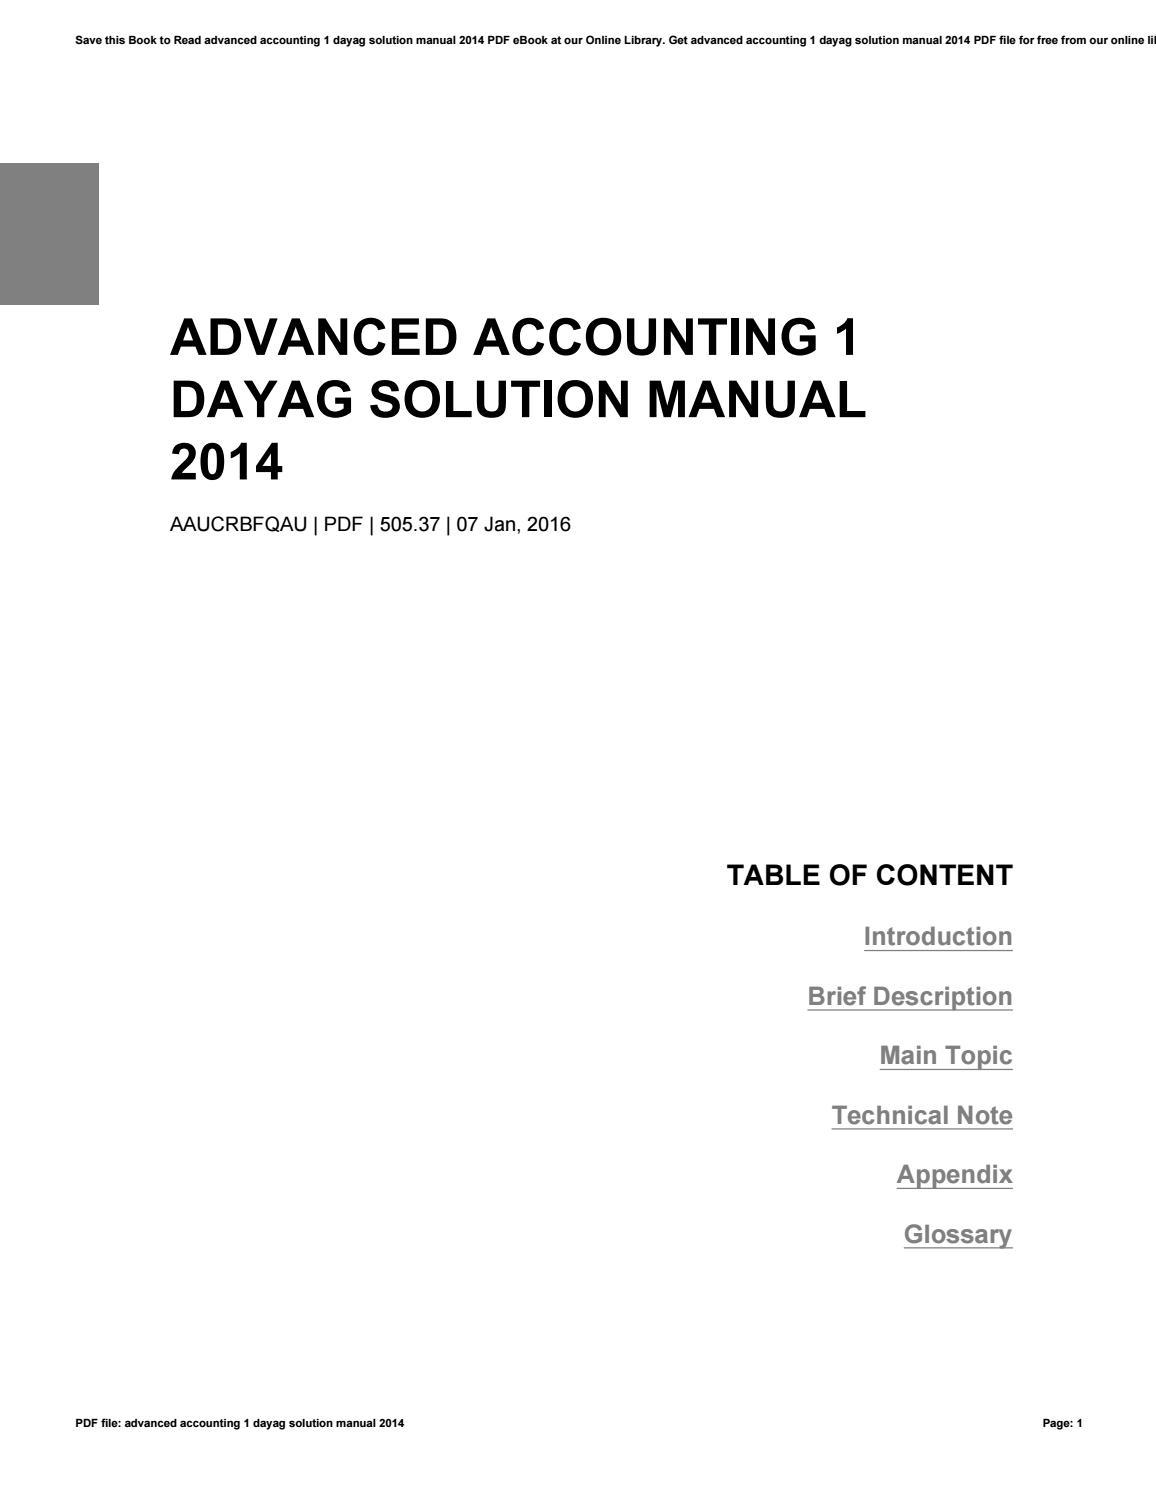 Bestseller: Advanced Accounting 2 Dayag Solution Manual 2017